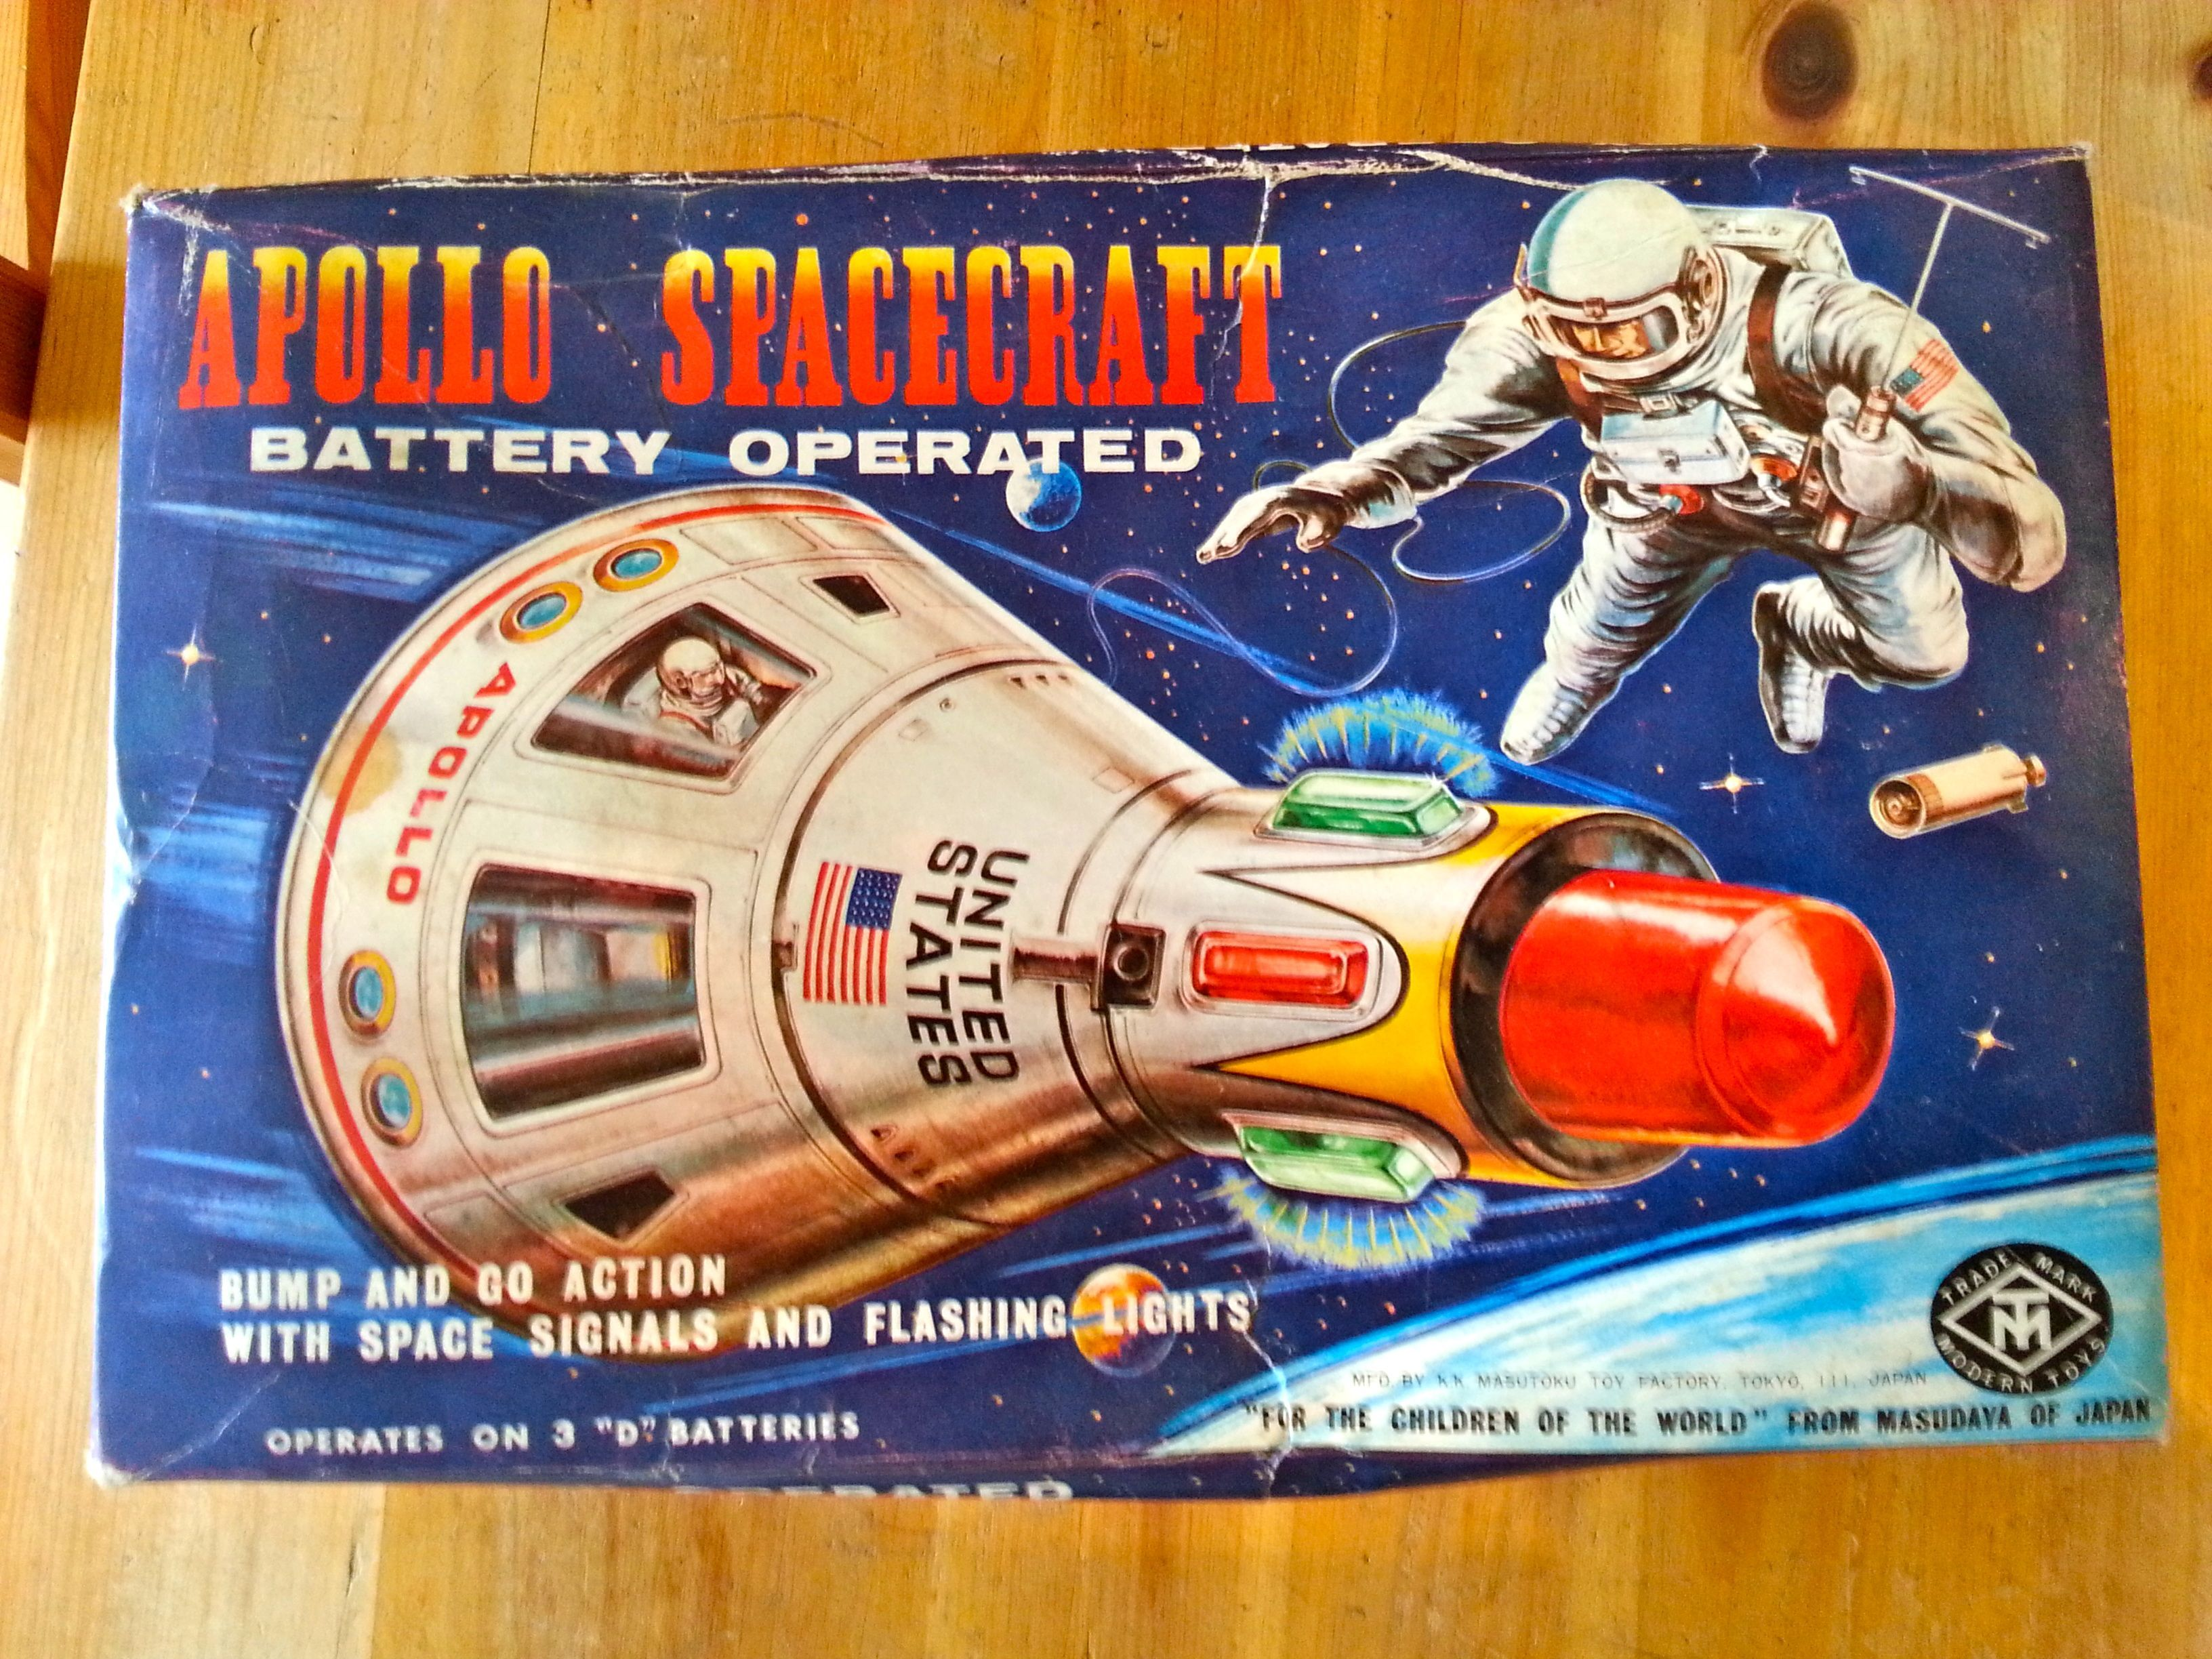 apollo spacecraft batteries - photo #11